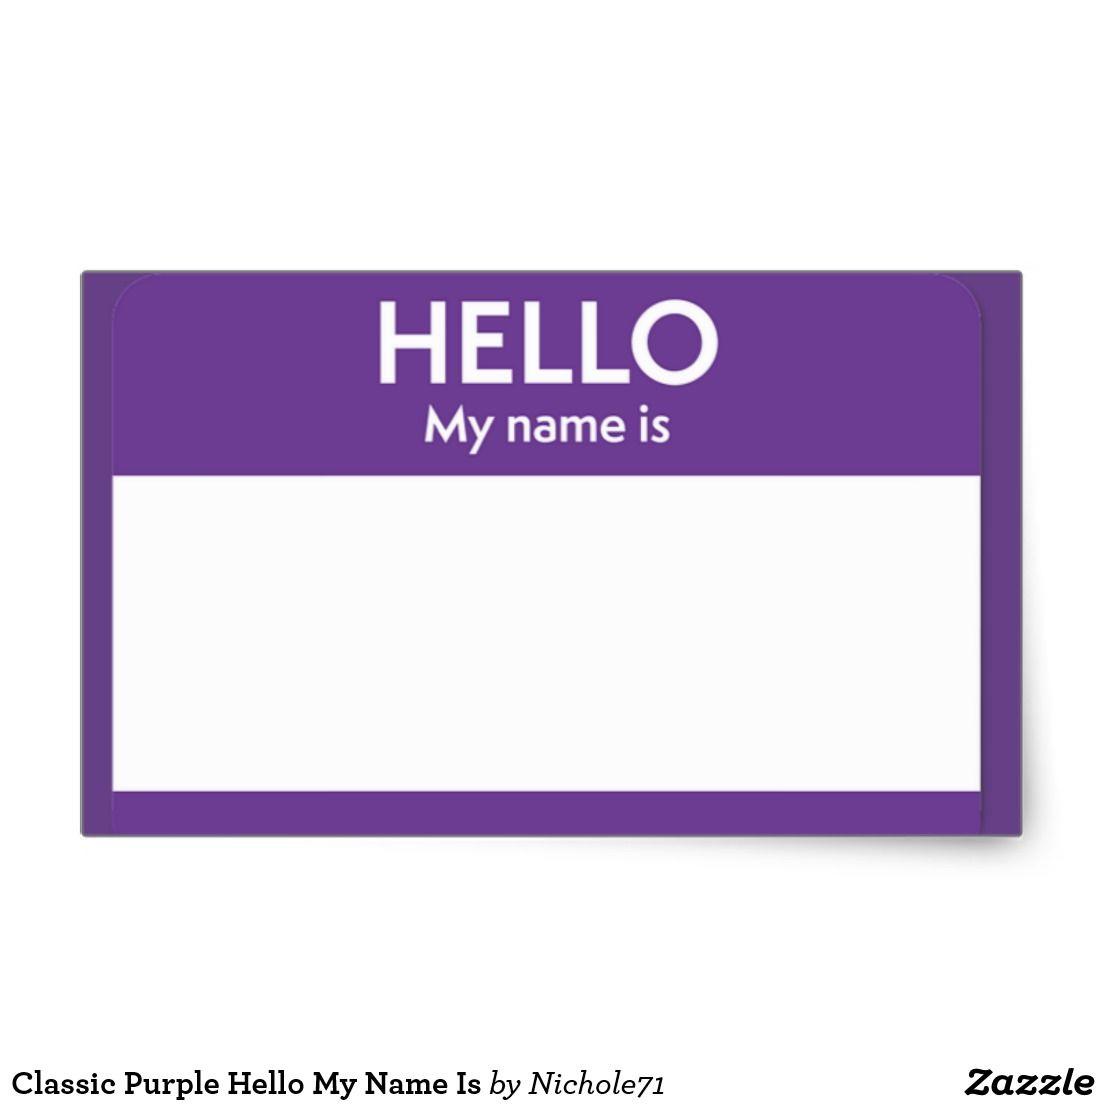 Classic Purple Hello My Name Is Rectangular Sticker Hello Sticker Comic Book Font Stickers